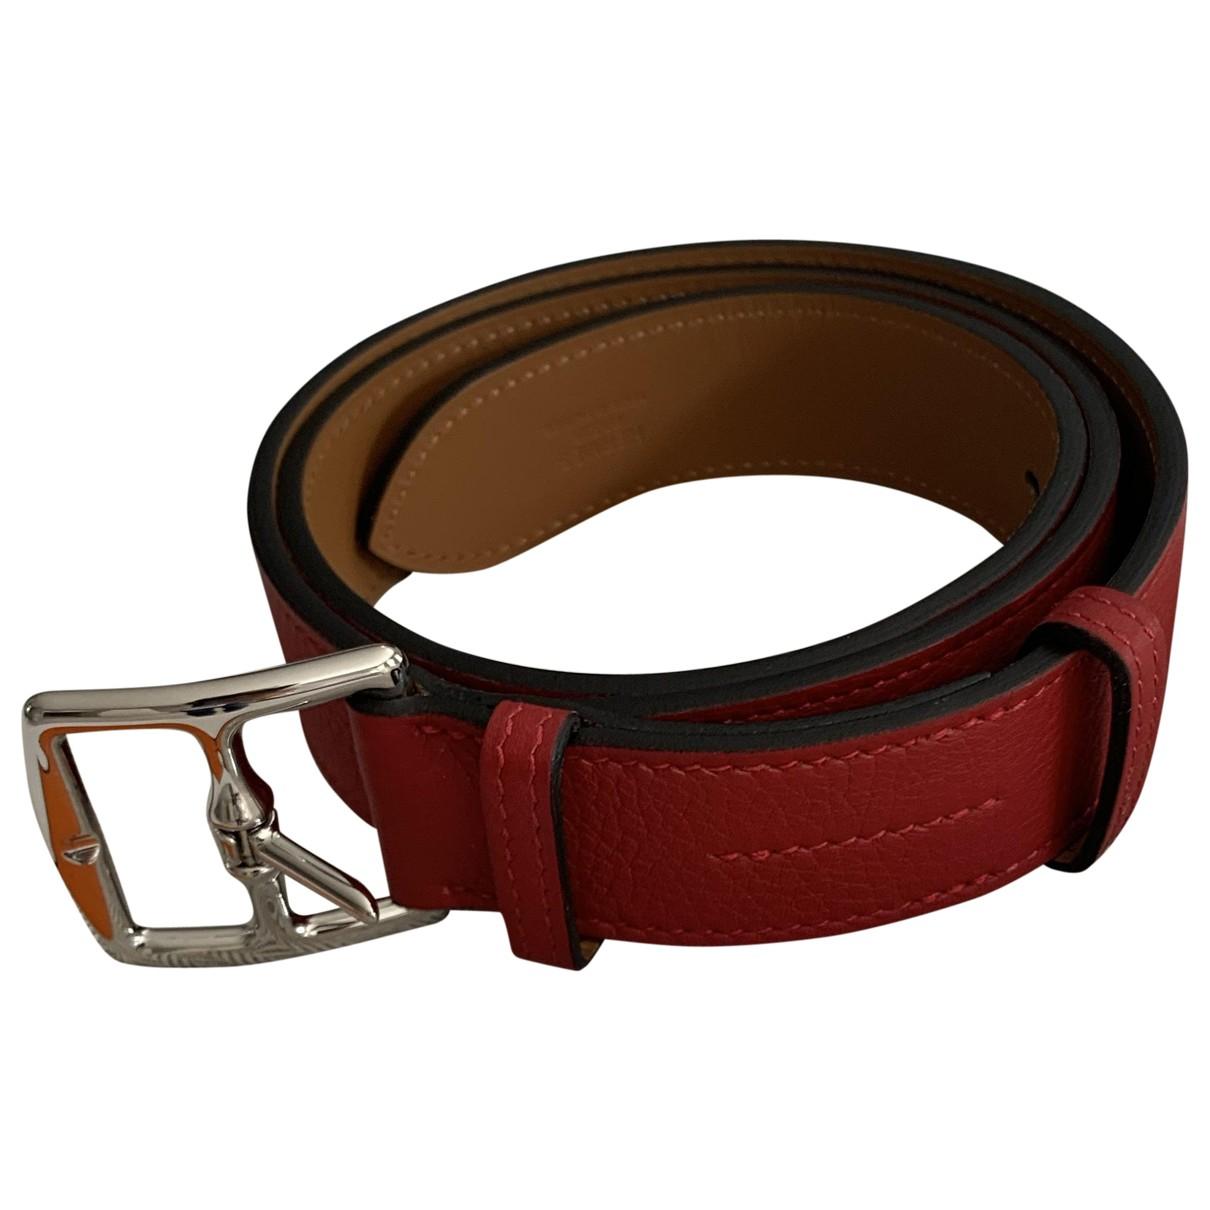 Cinturon Etriviere de Cuero Hermes